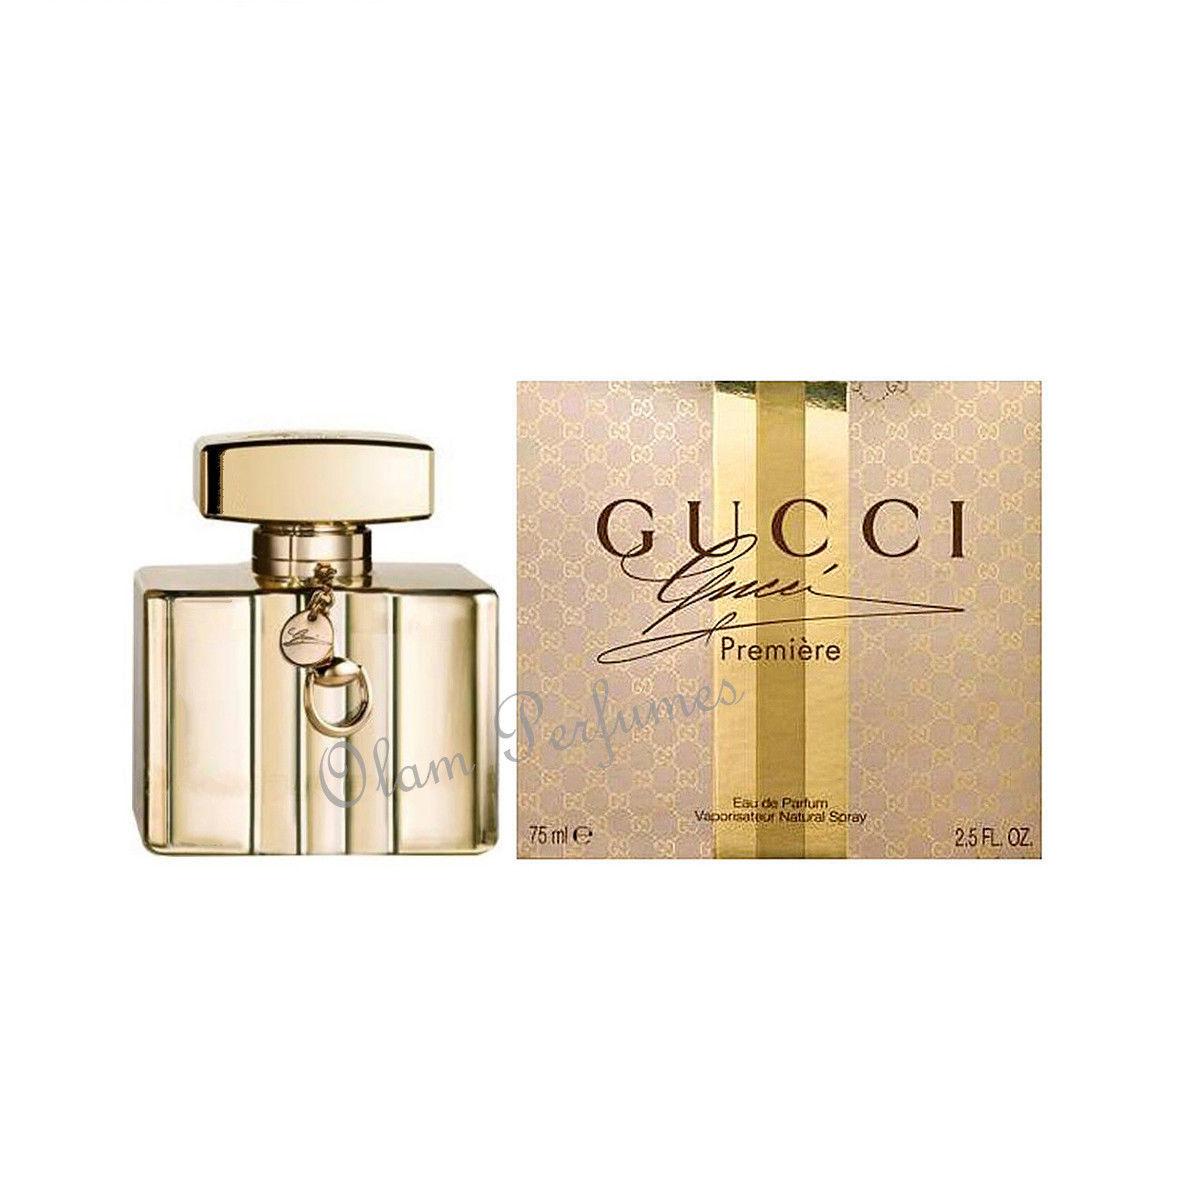 9e2d912f0 Gucci Premiere For Women Eau de Parfum Spray 2.5oz 75ml * New in Box Sealed  *